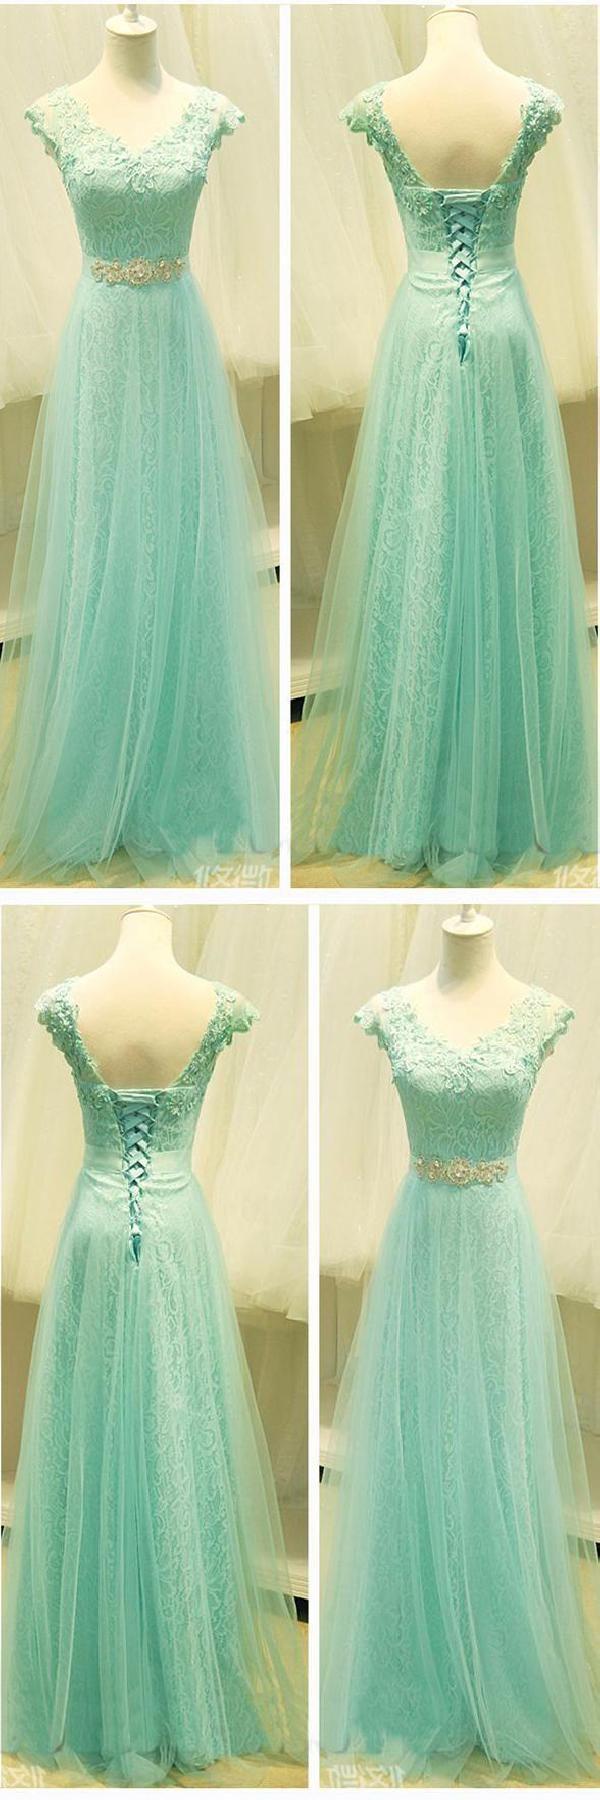 Hot sale distinct lace prom dresses prom dresses ropa